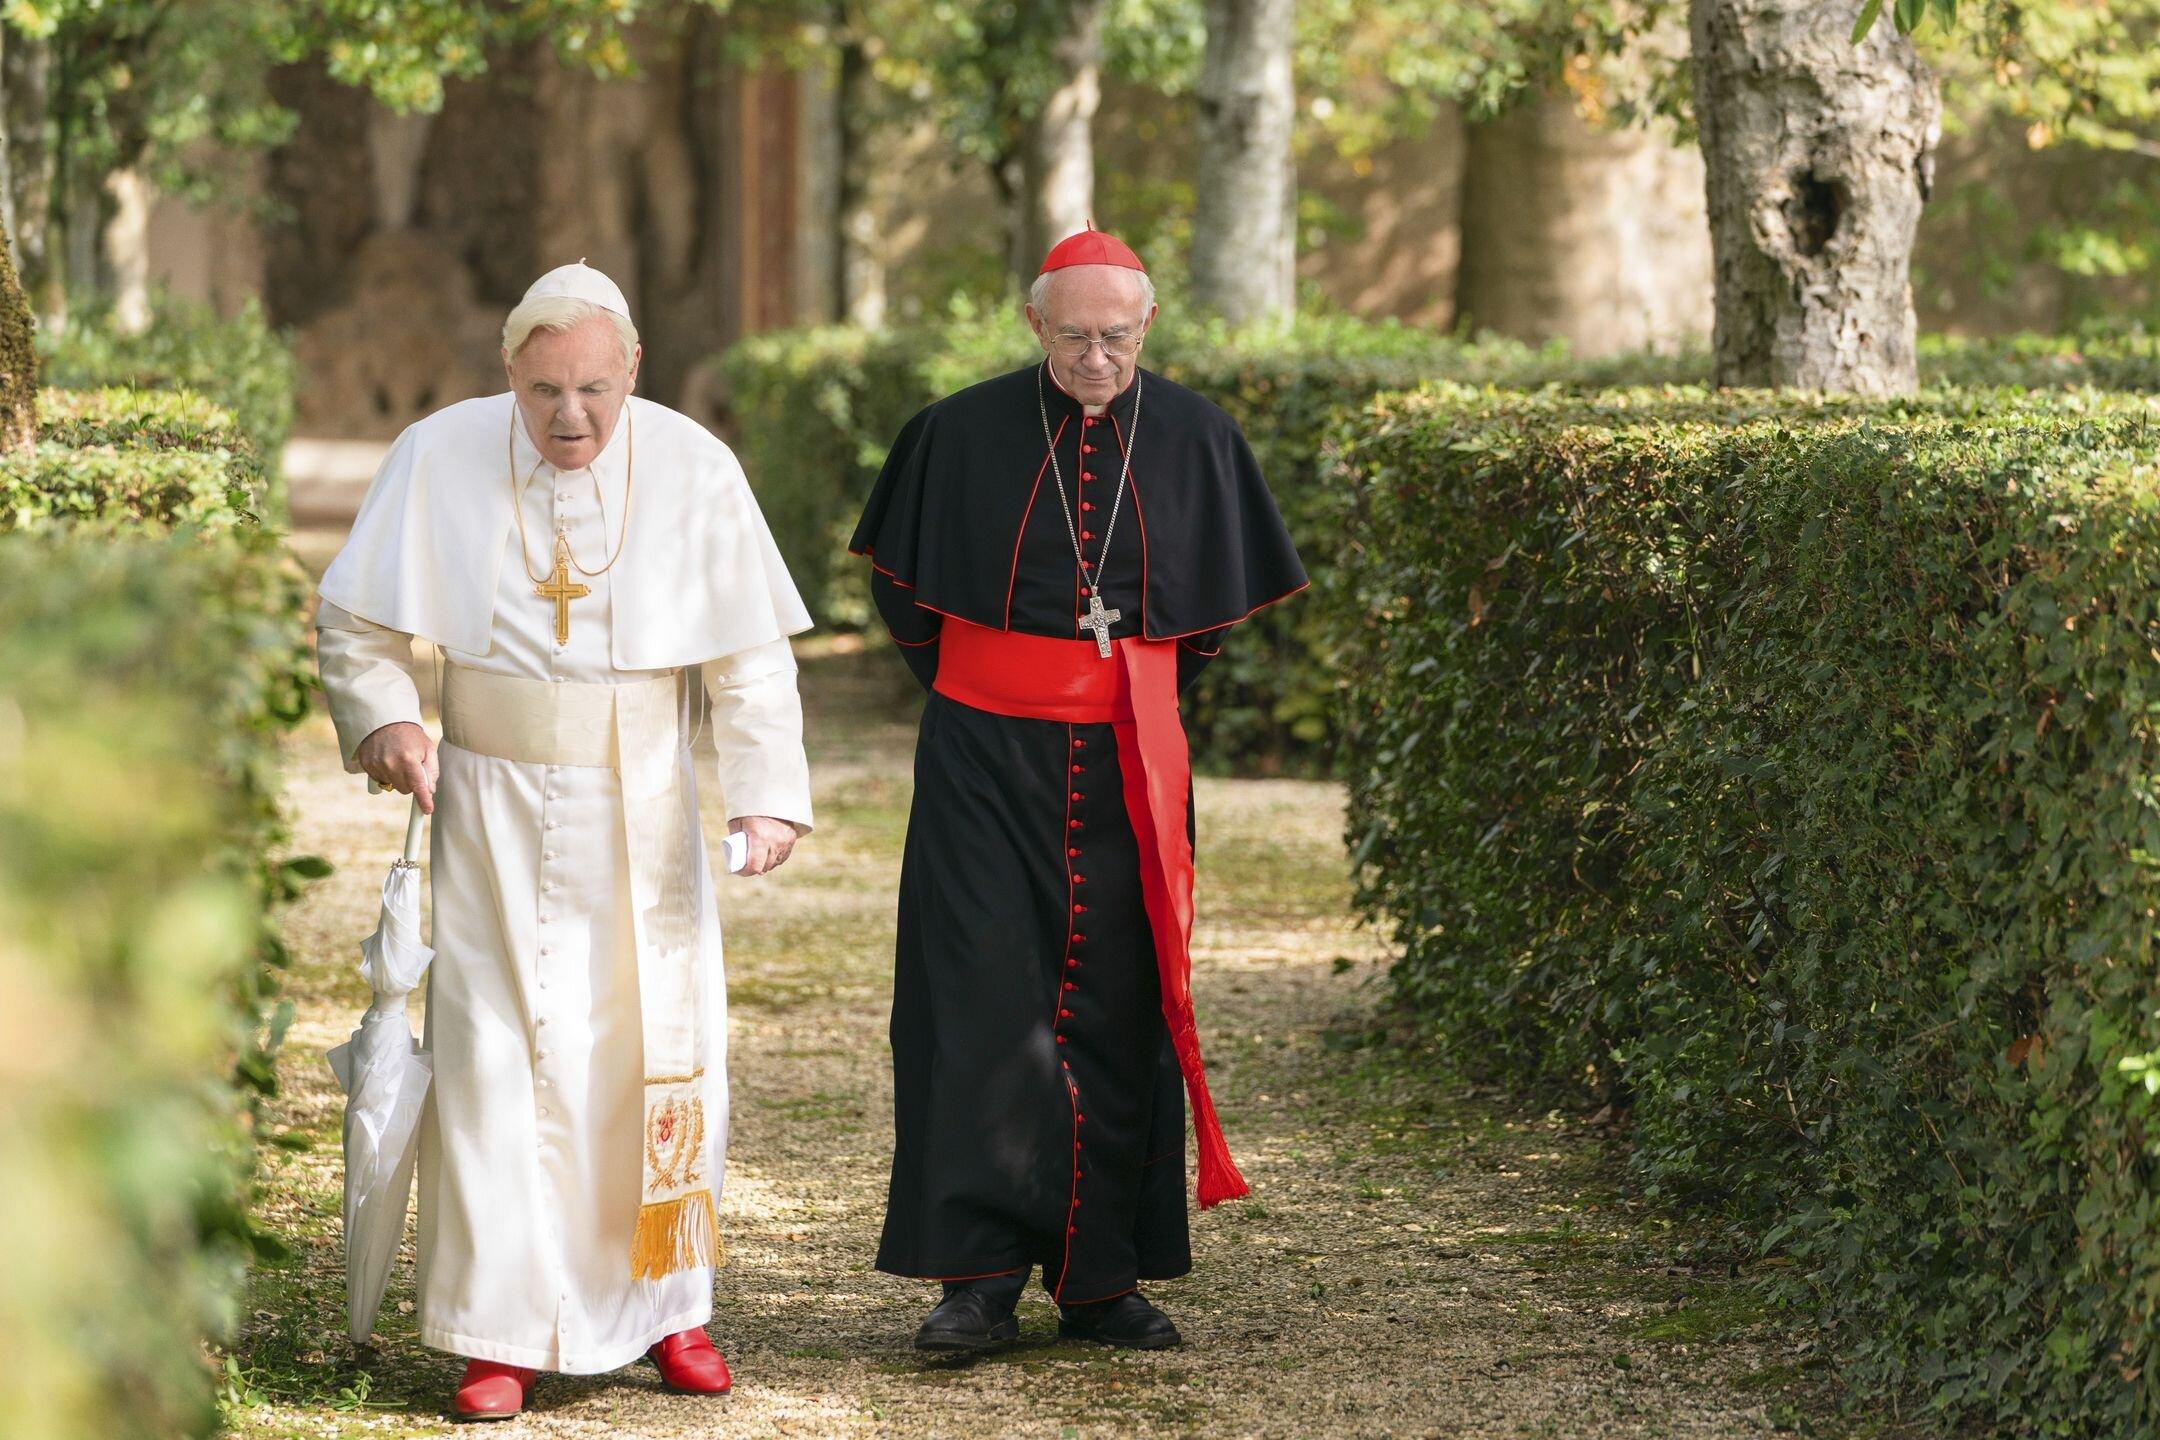 Resultado de imagen para the two popes